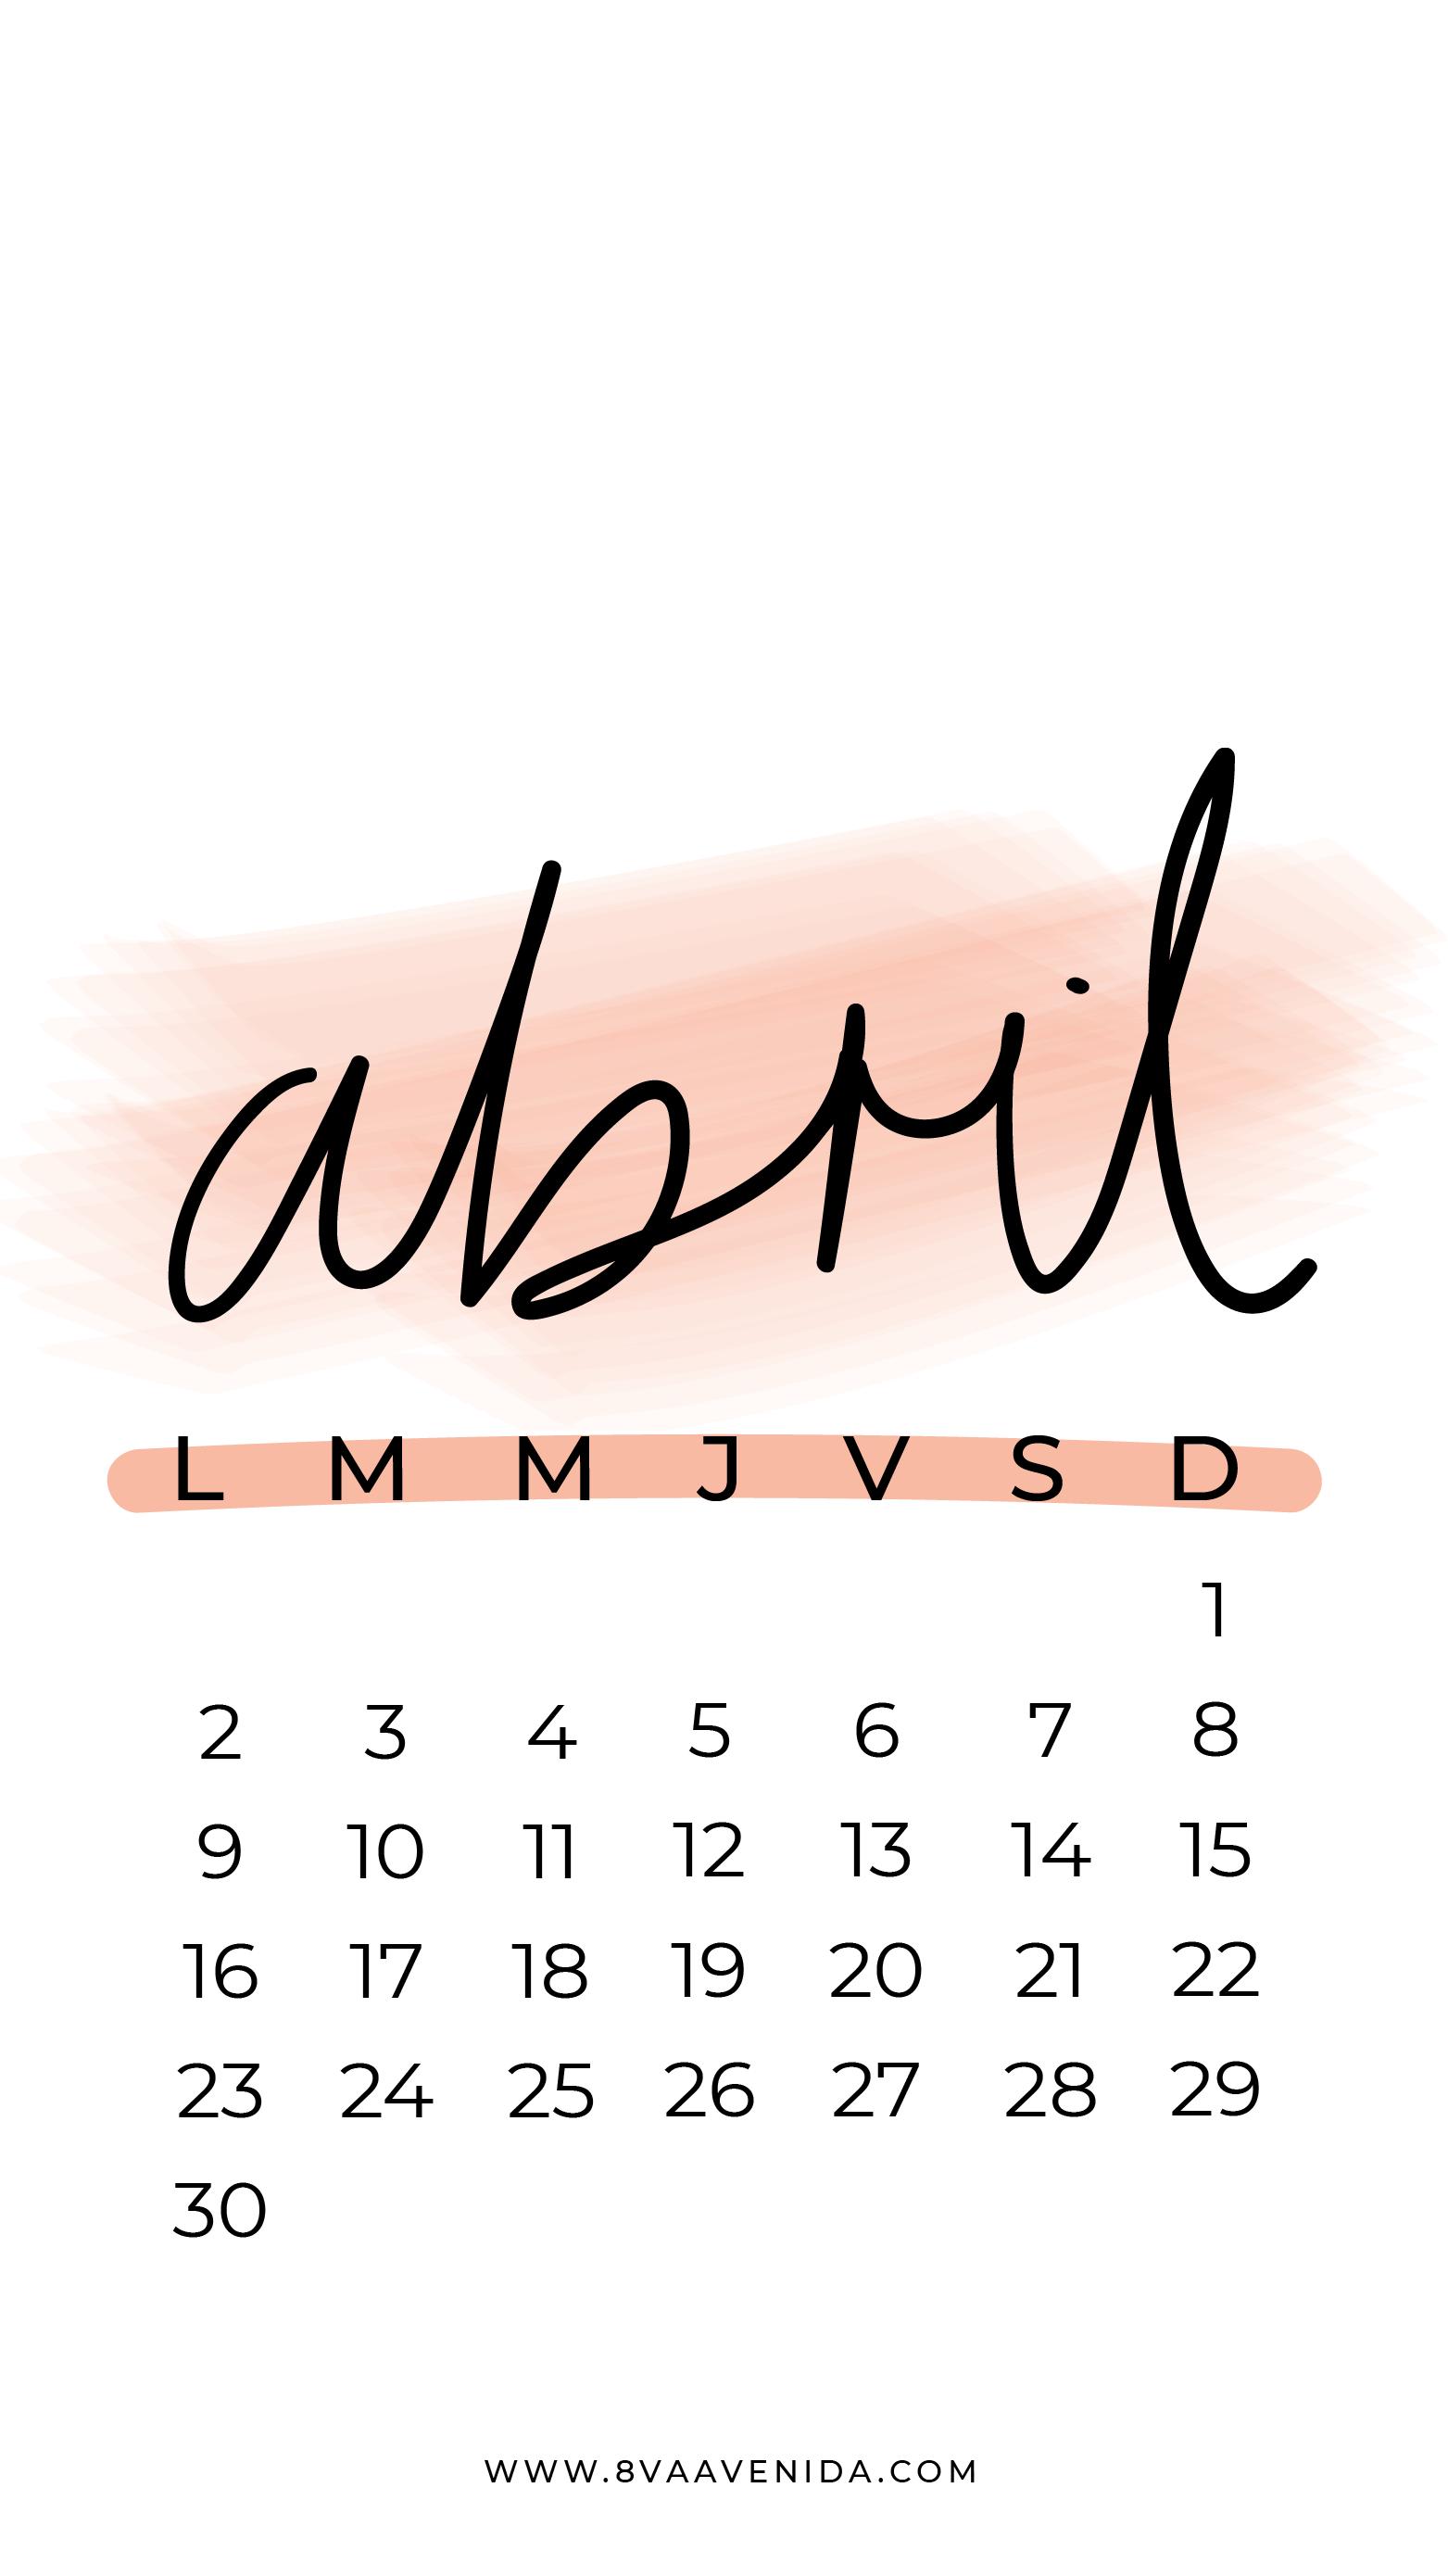 Calendario Dibujo Png.Pin De N N En Fondos De Pantalls Calendario Tumblr Fondo